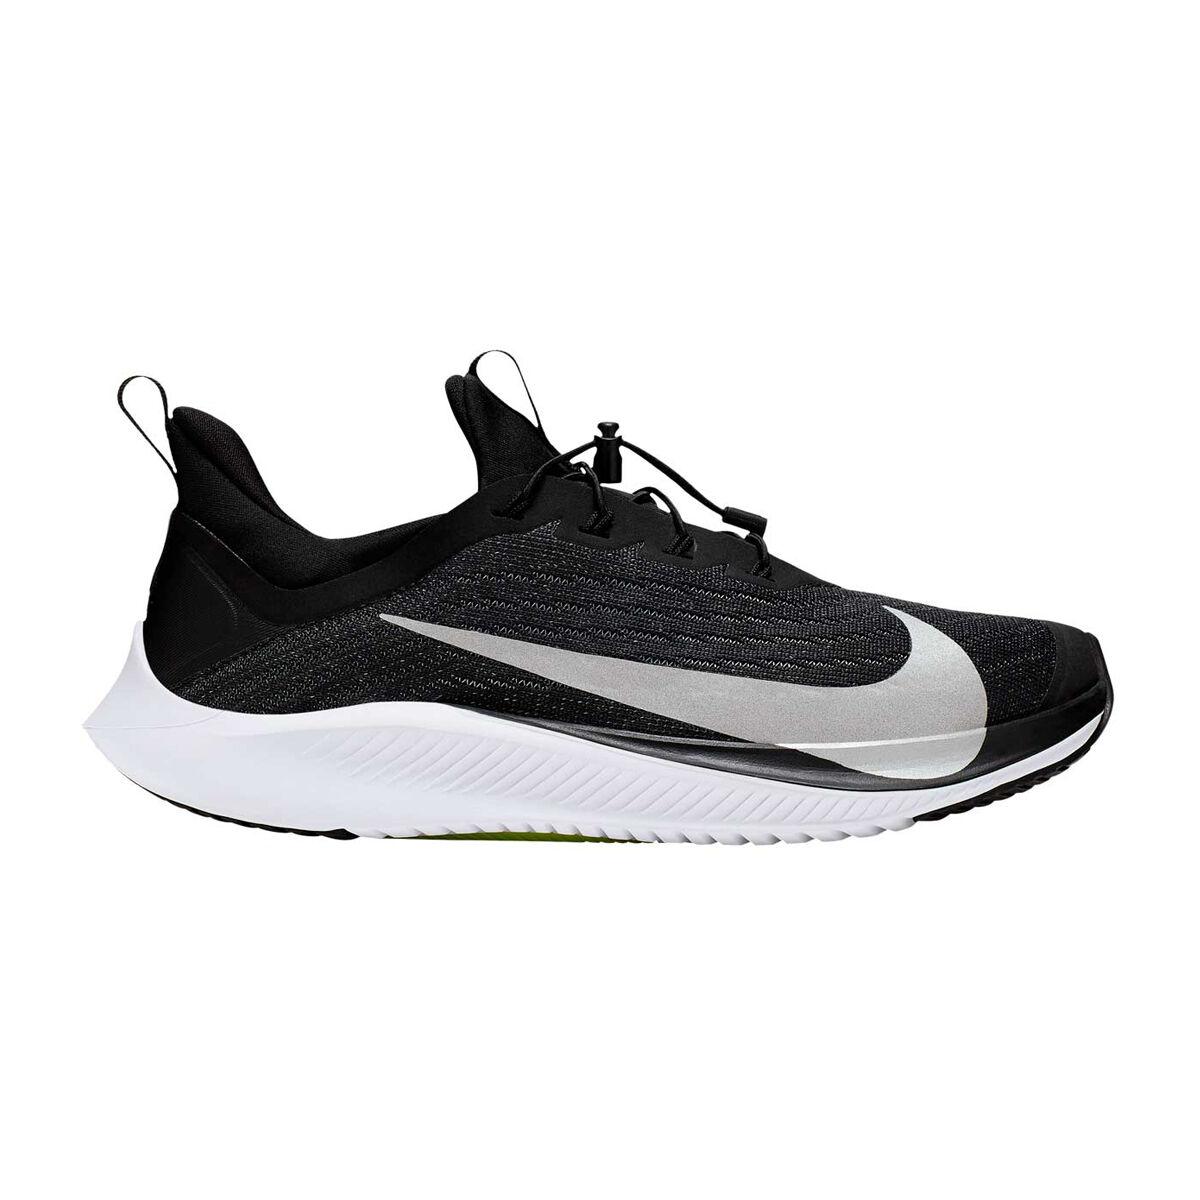 Nike Future Speed 2 Kids Running Shoes